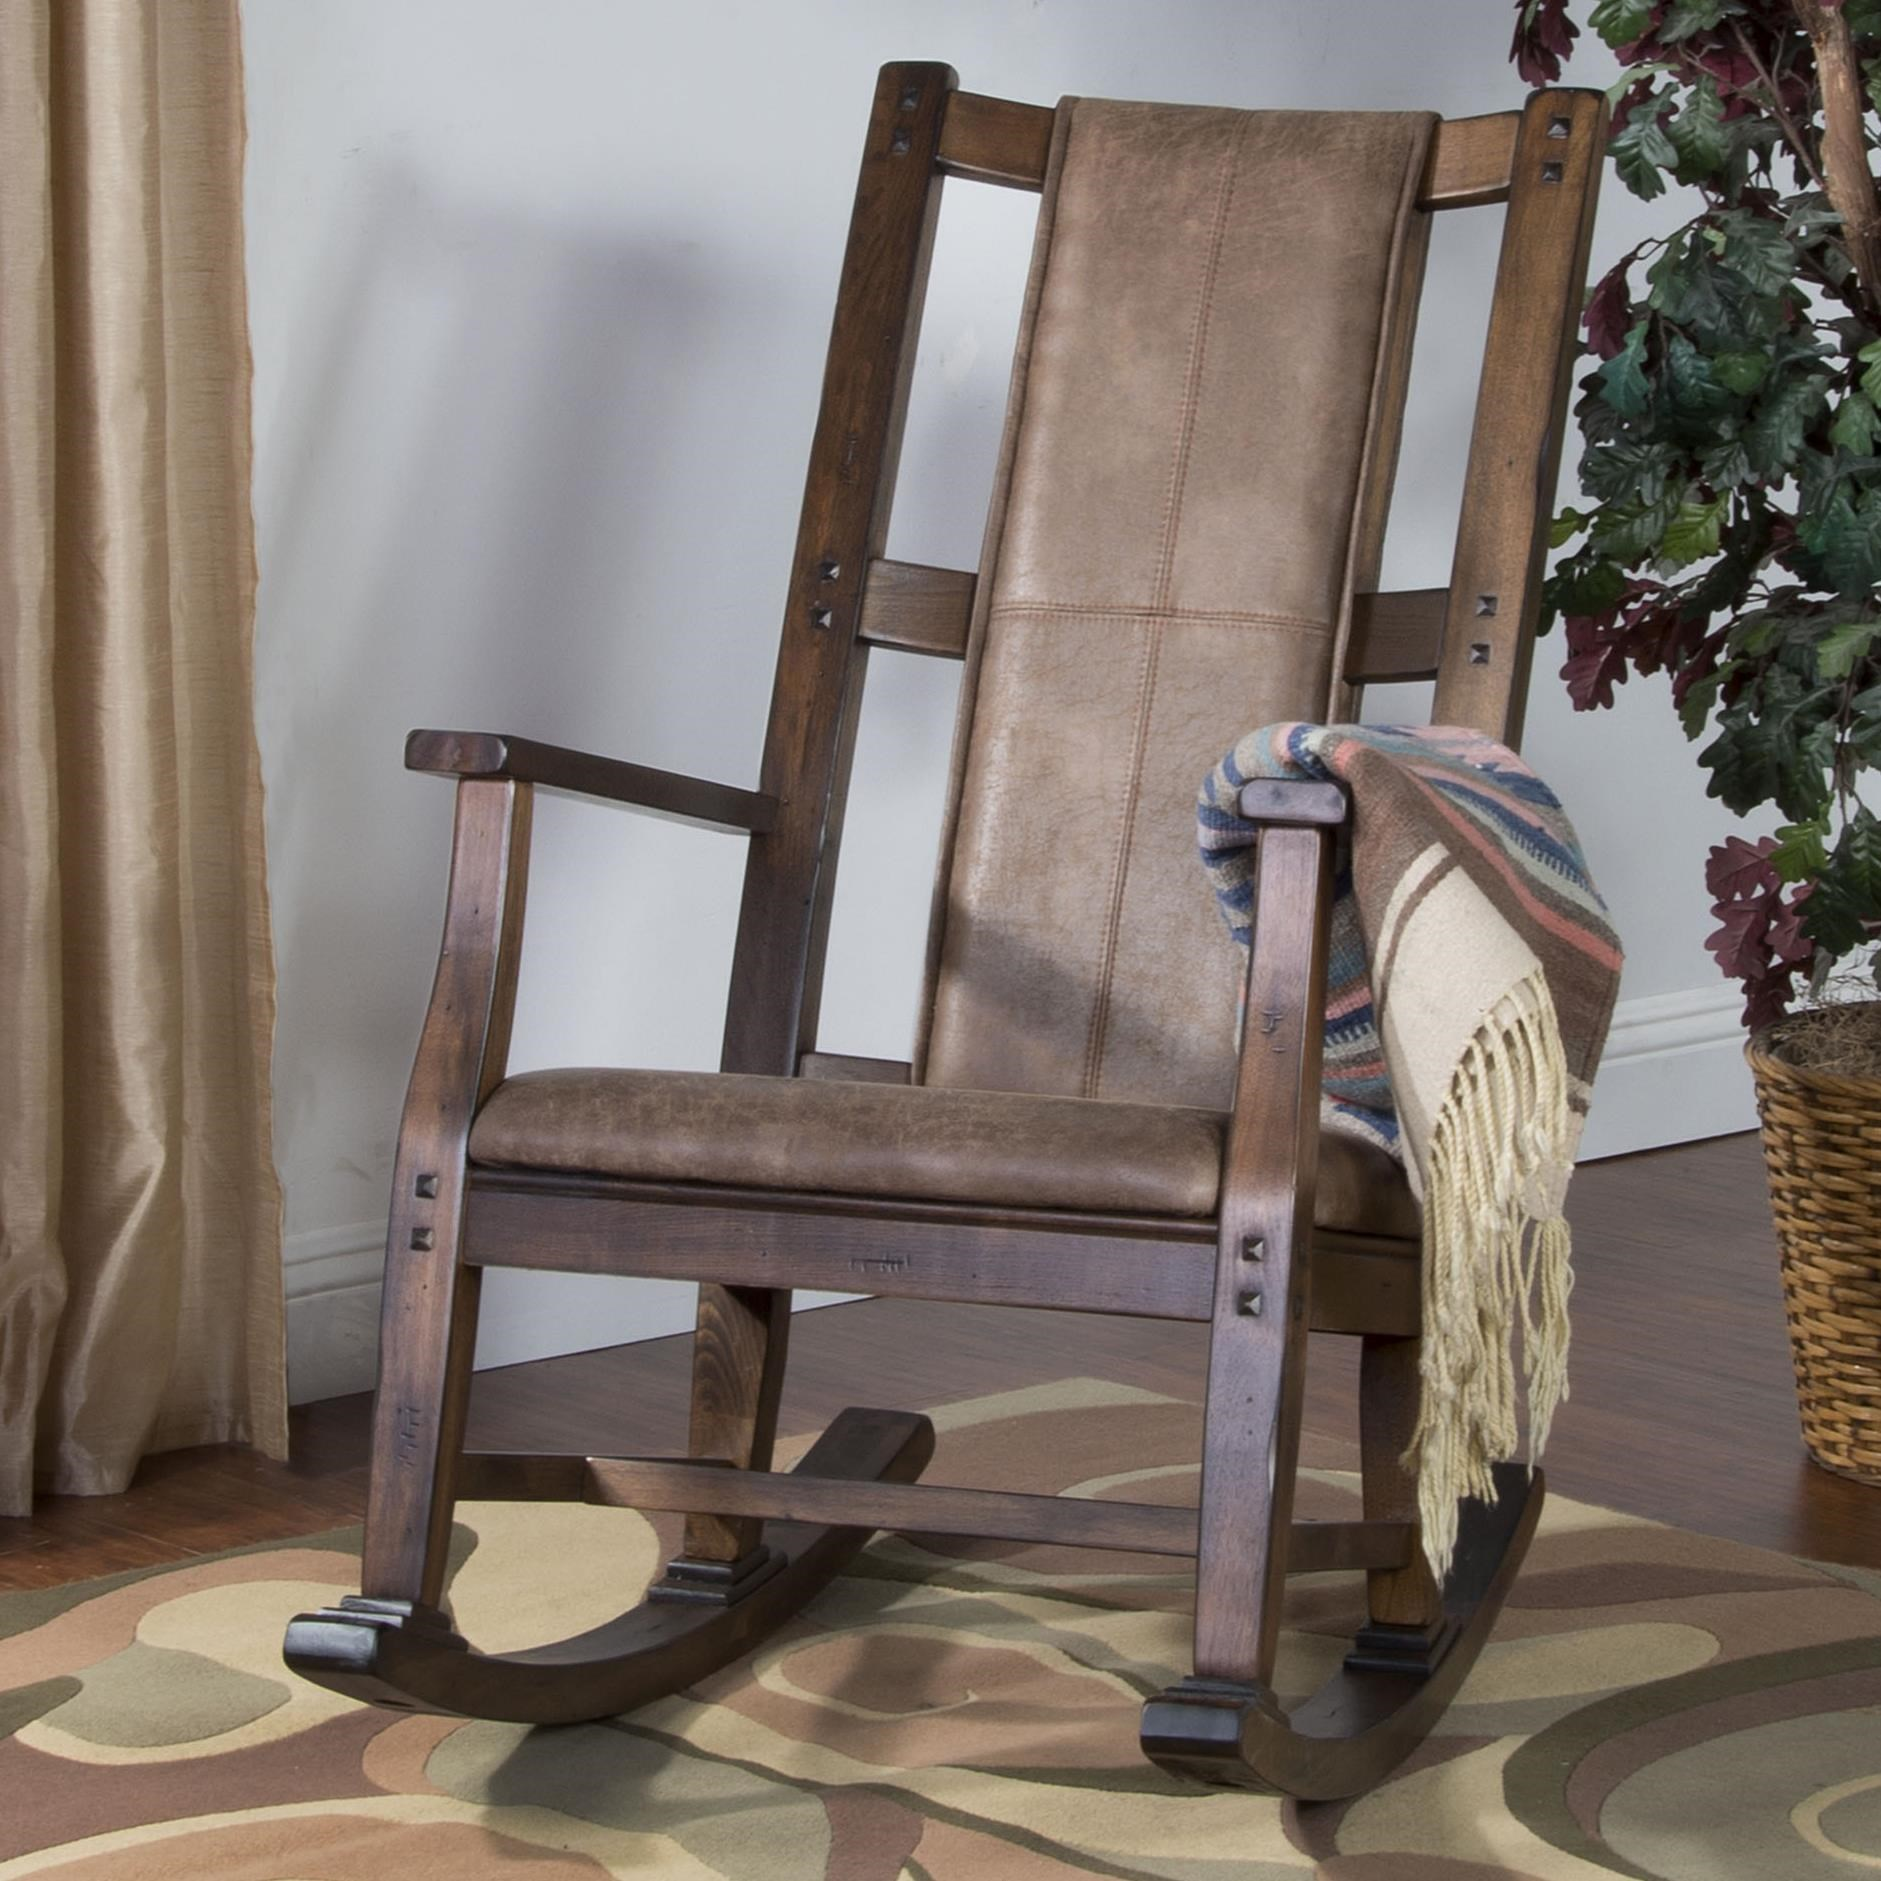 Wood Rocker w/ Cushion Seat & Back